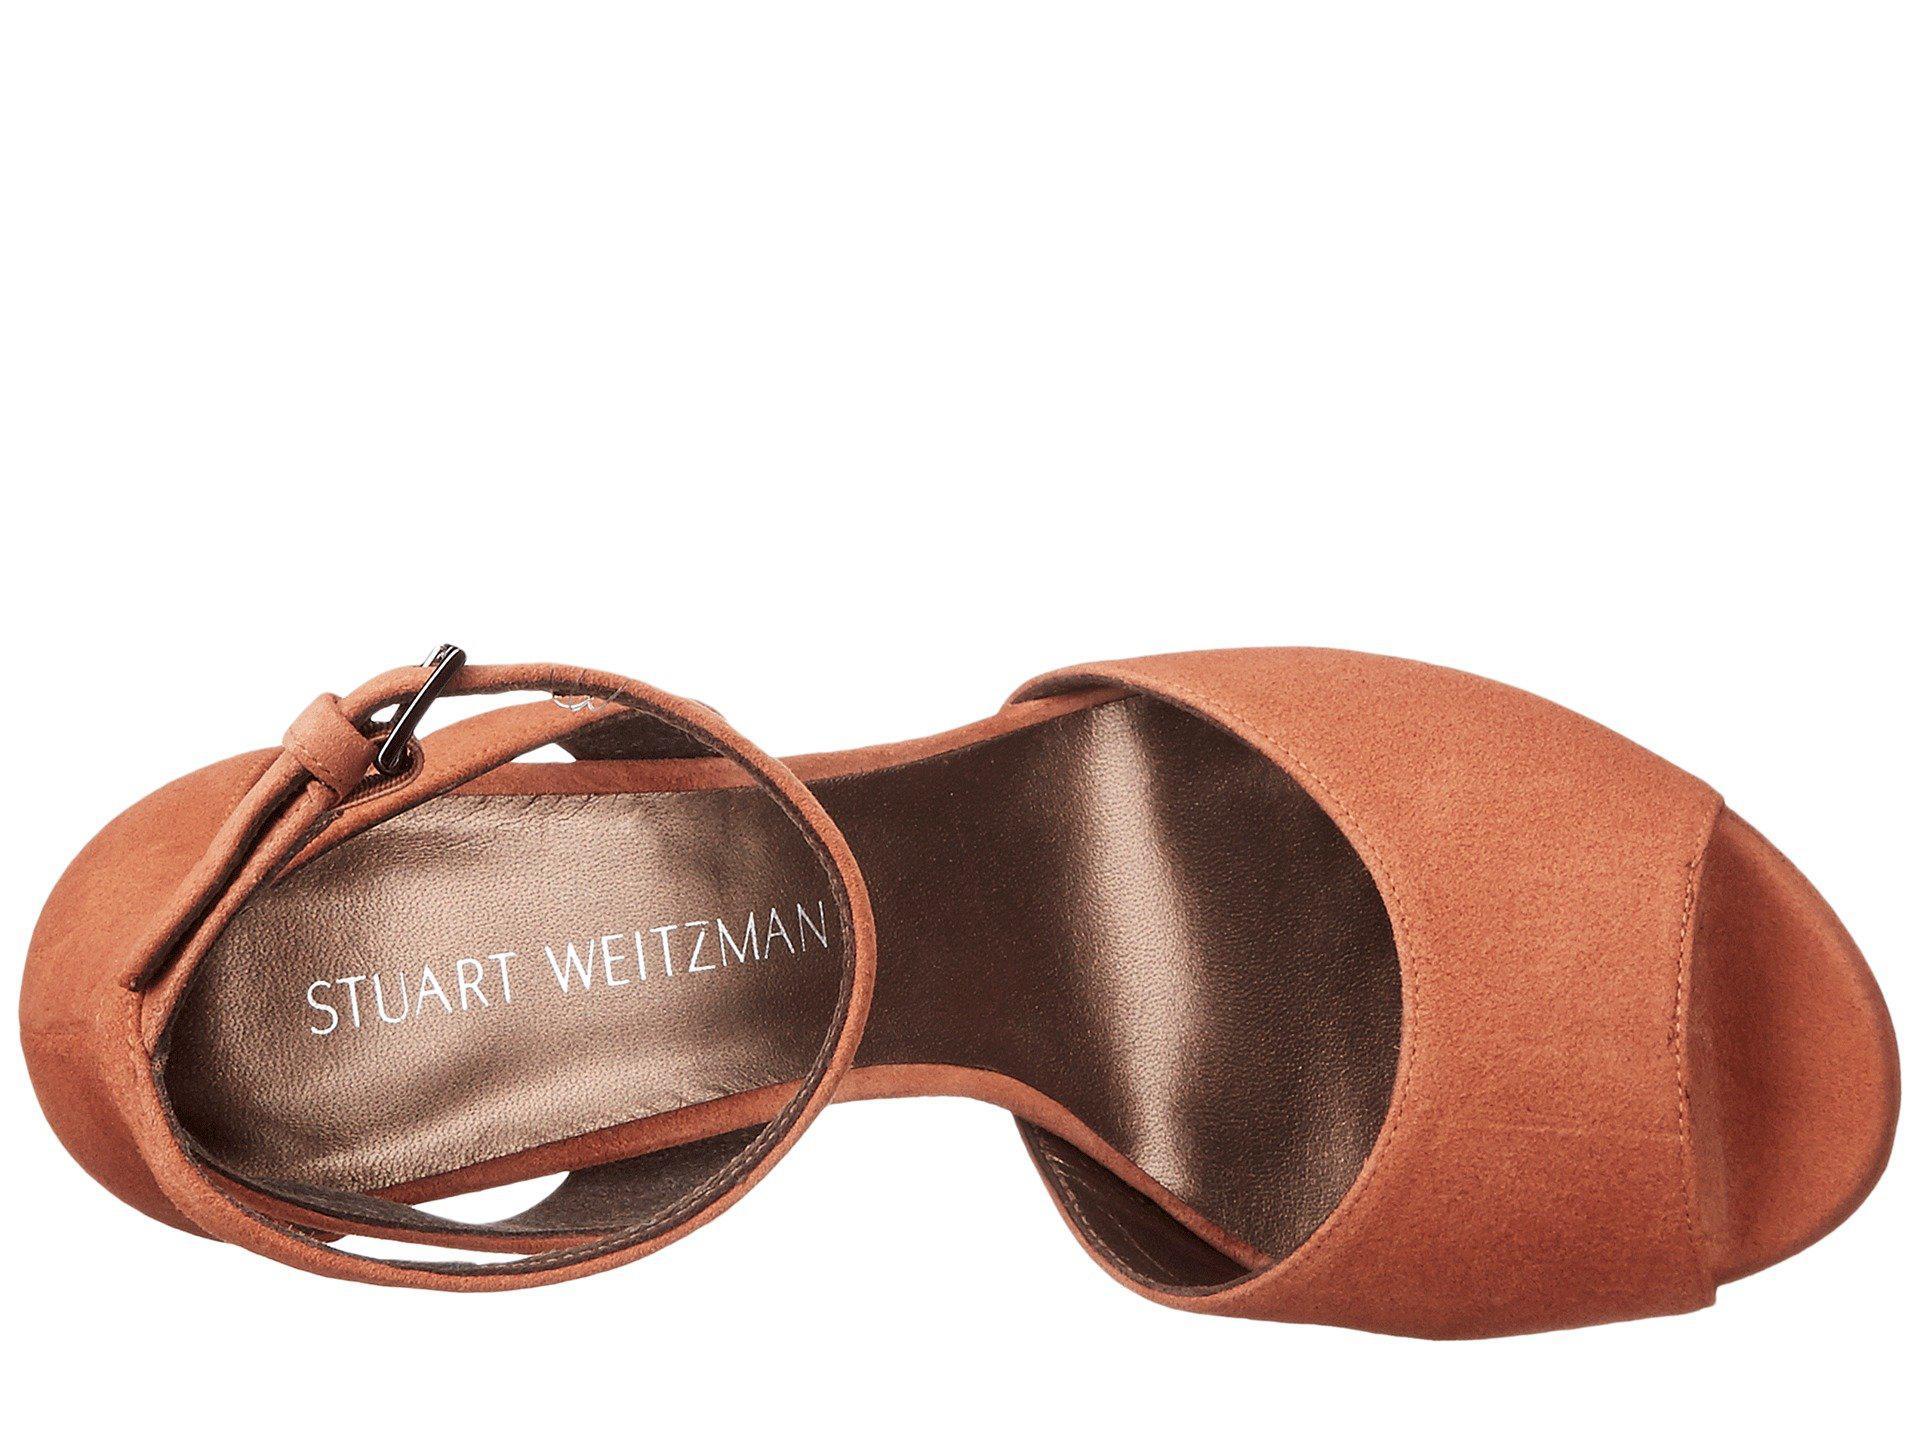 aa95ed100ae Lyst - Stuart Weitzman Hijinx in Brown